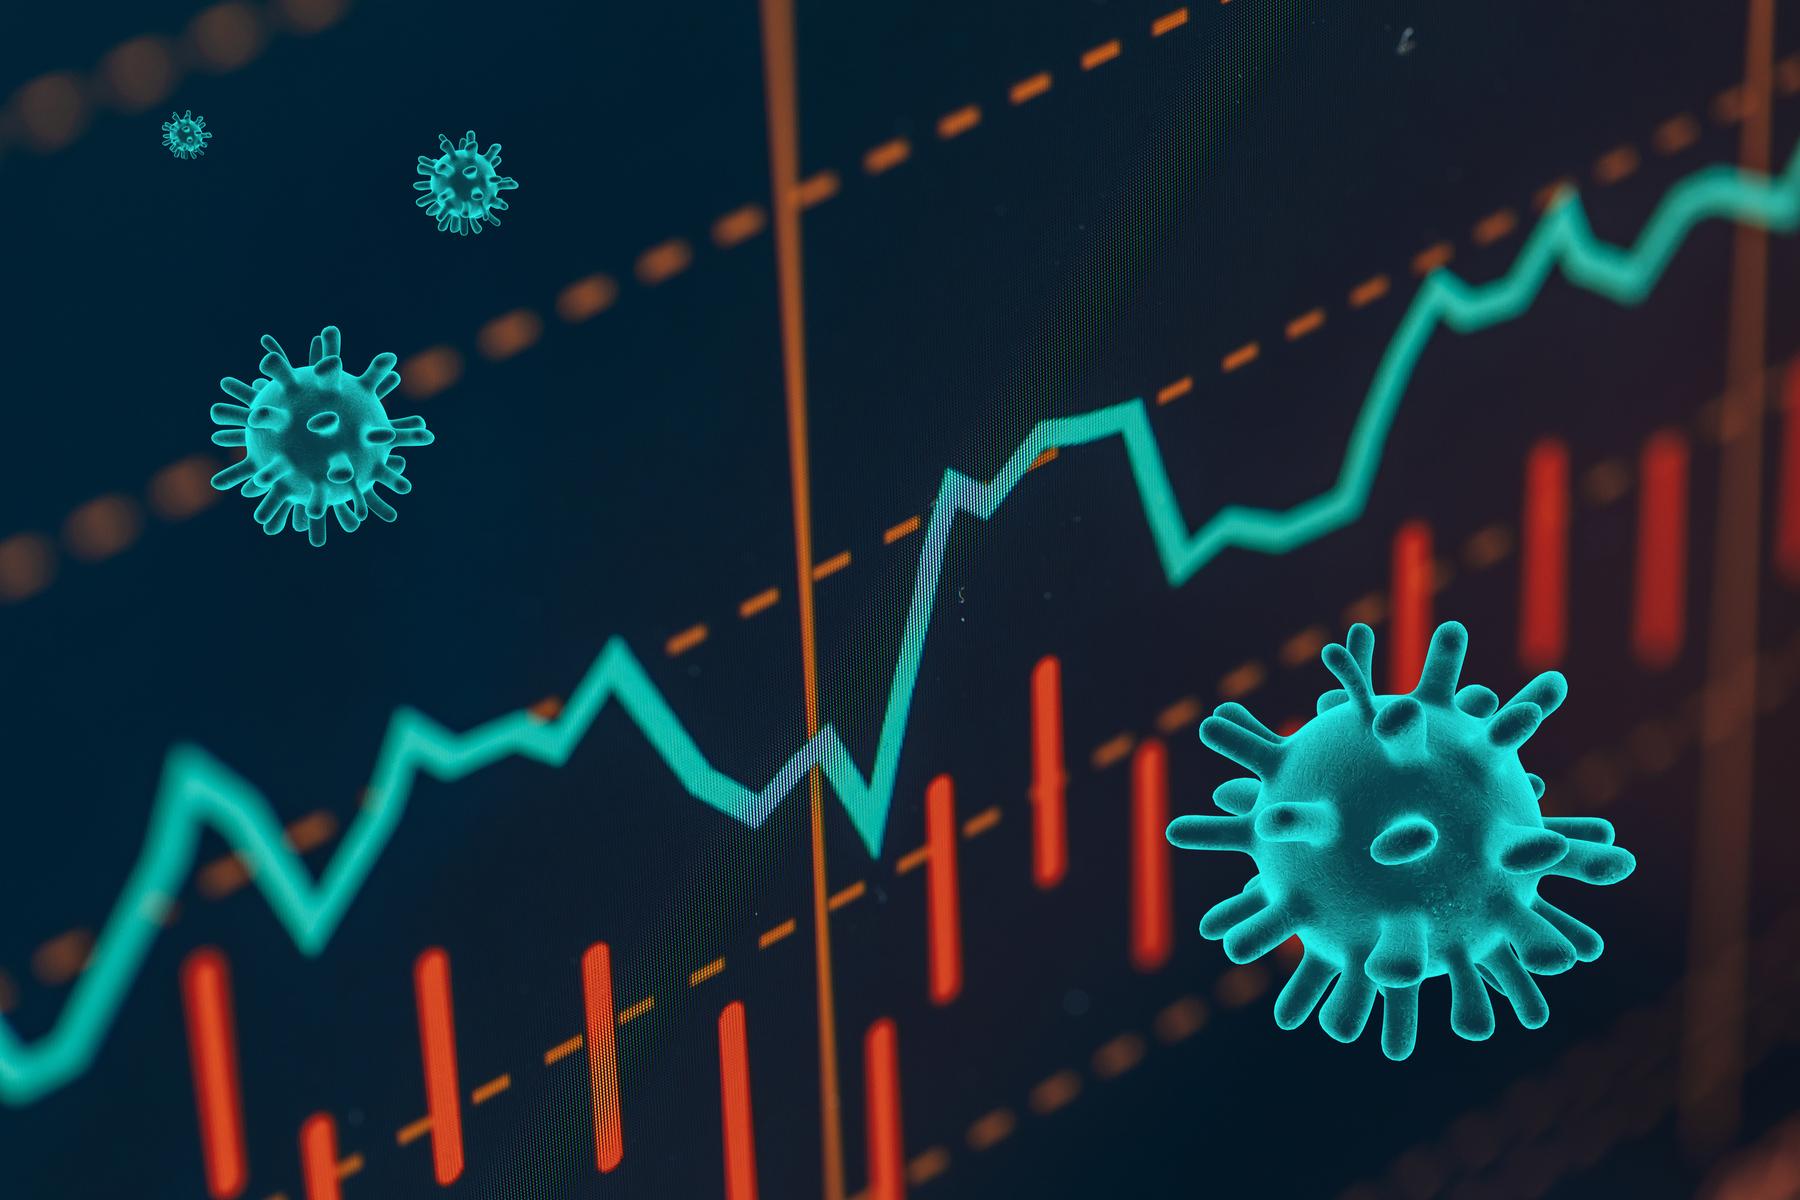 Coronavirus: From Health Crisis to Financial Crisis